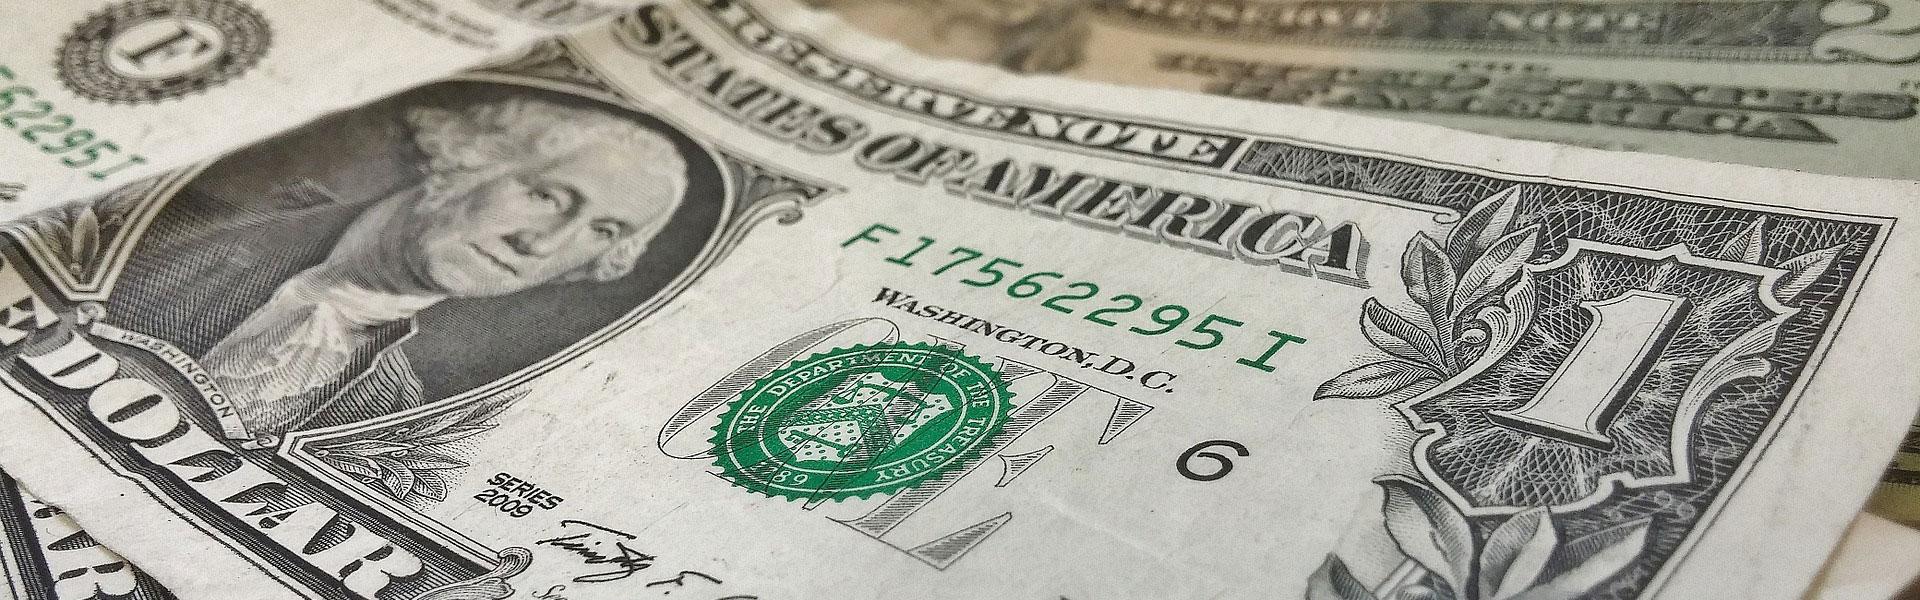 B2B Lead Generation Using Inbound Marketing to Increase Profits